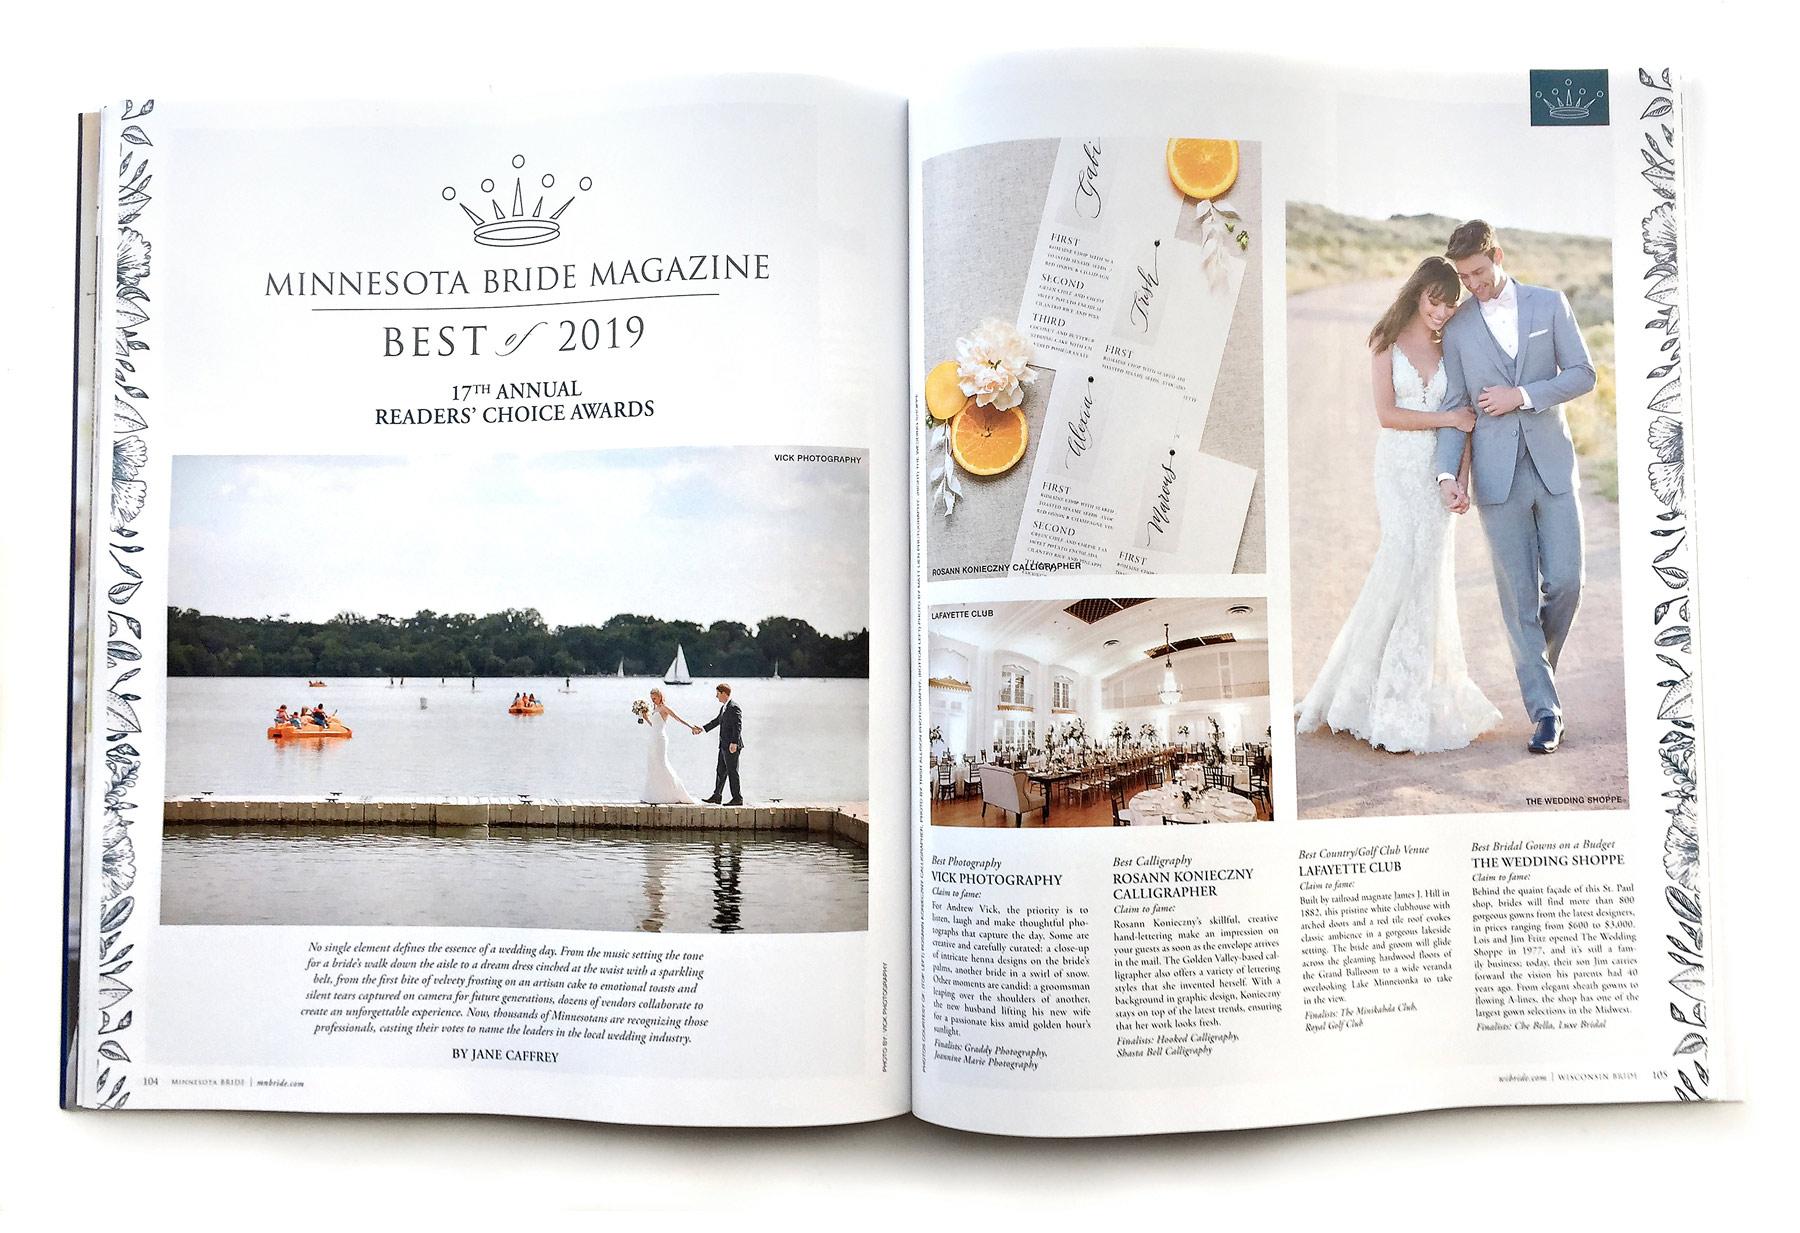 02-Minnesota-Bride-Magazine-2019-Fall-Winter-Vick-Photography-Best-Of-Awards.jpg